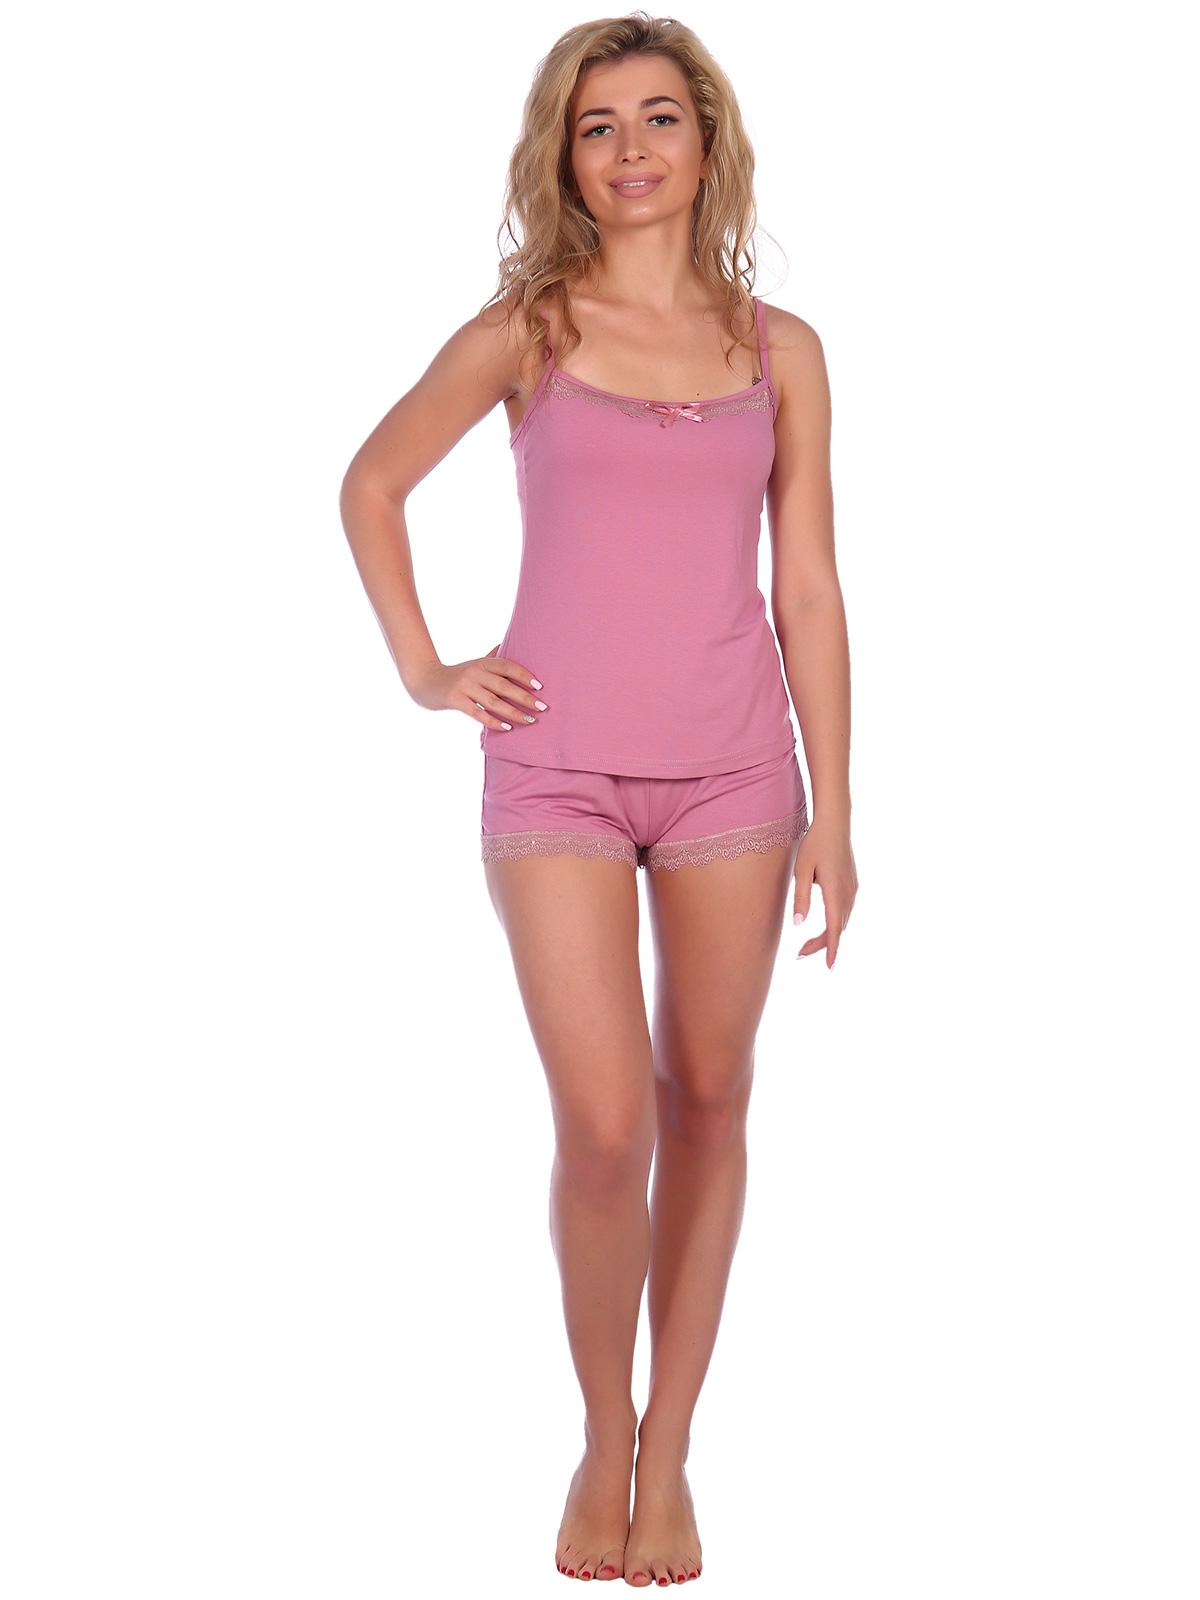 Жен. пижама арт. 16-0573 Розовый р. 50 НСД Трикотаж